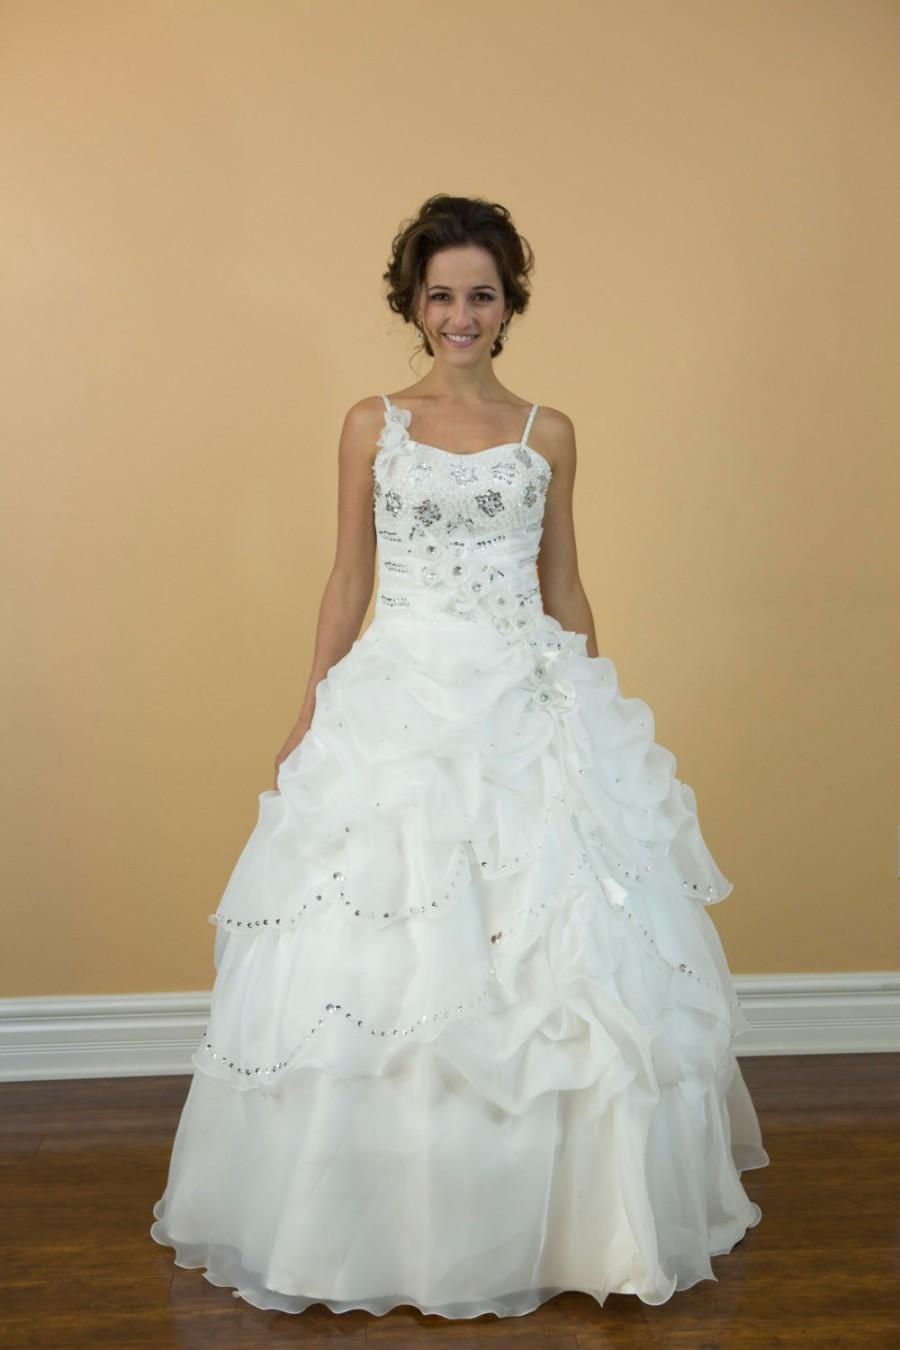 Boda - Sweet 16, Prom Romantic Ballgown, White Sweetheart with thin straps Organza Wedding dress